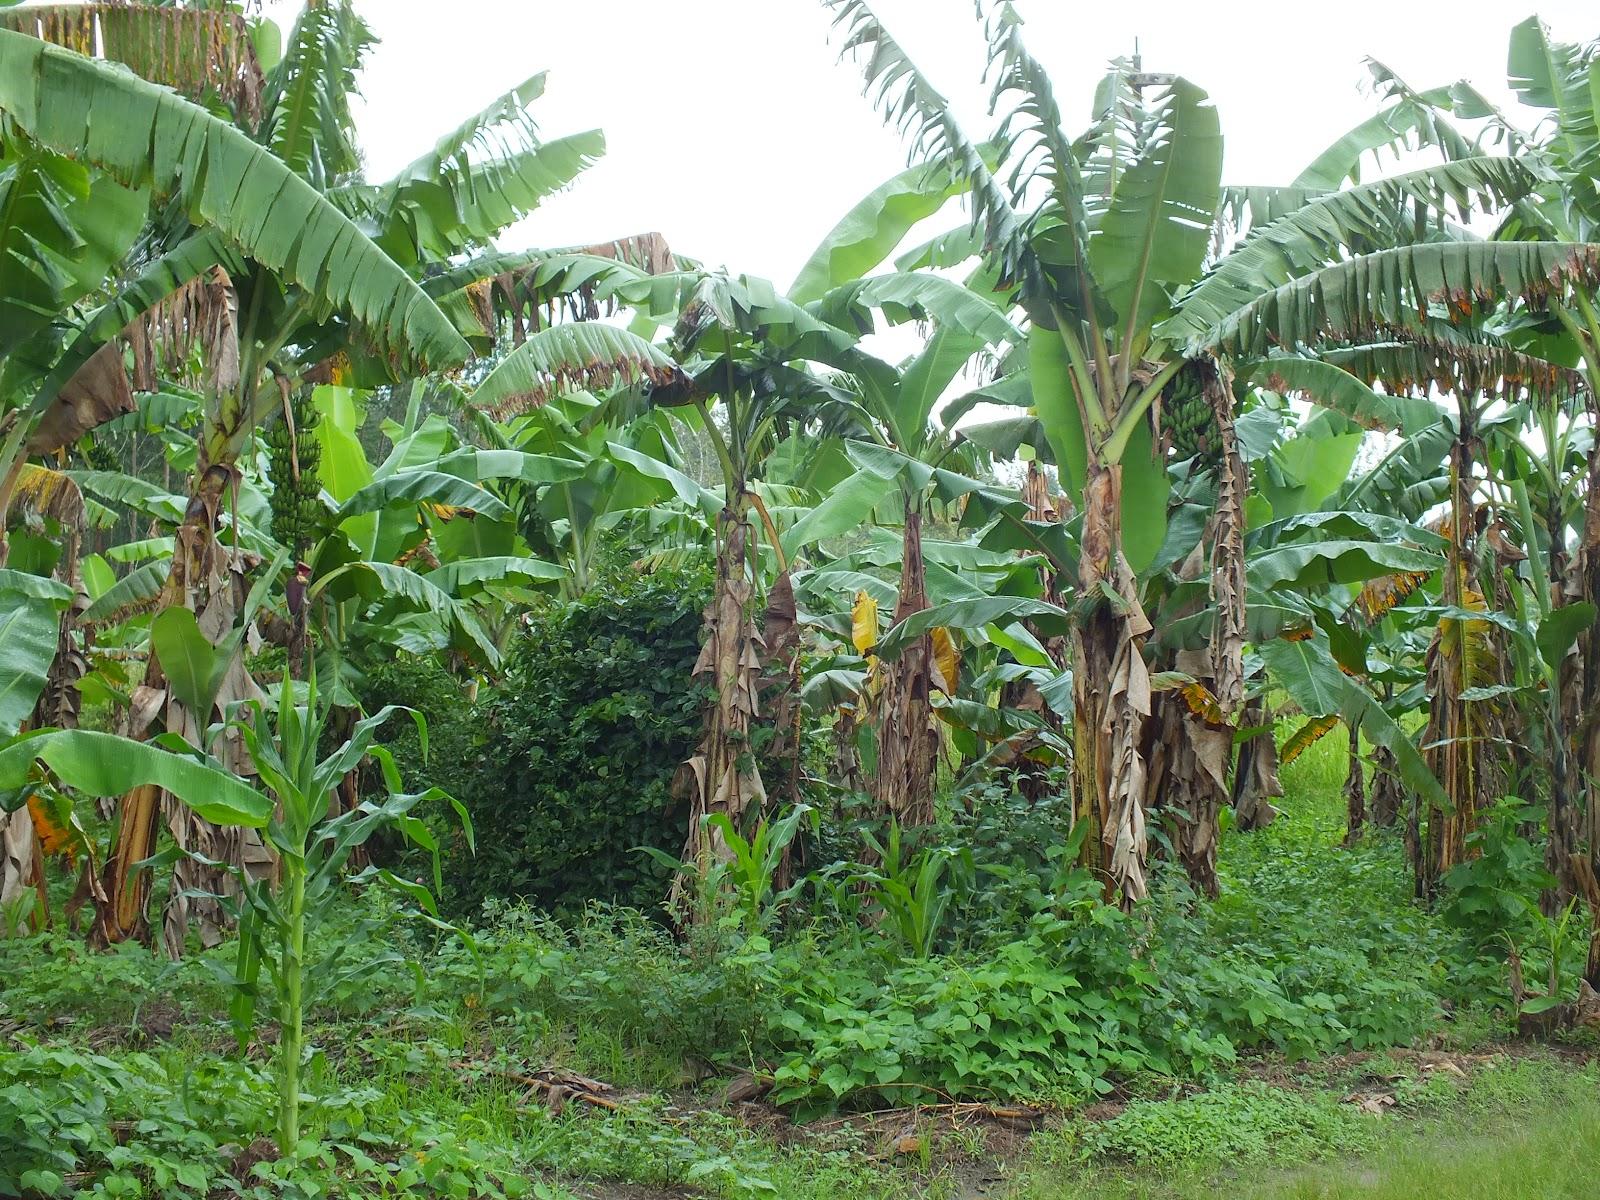 Planten En Bomen : Bomen en planten in kagera tanzania treeseedz